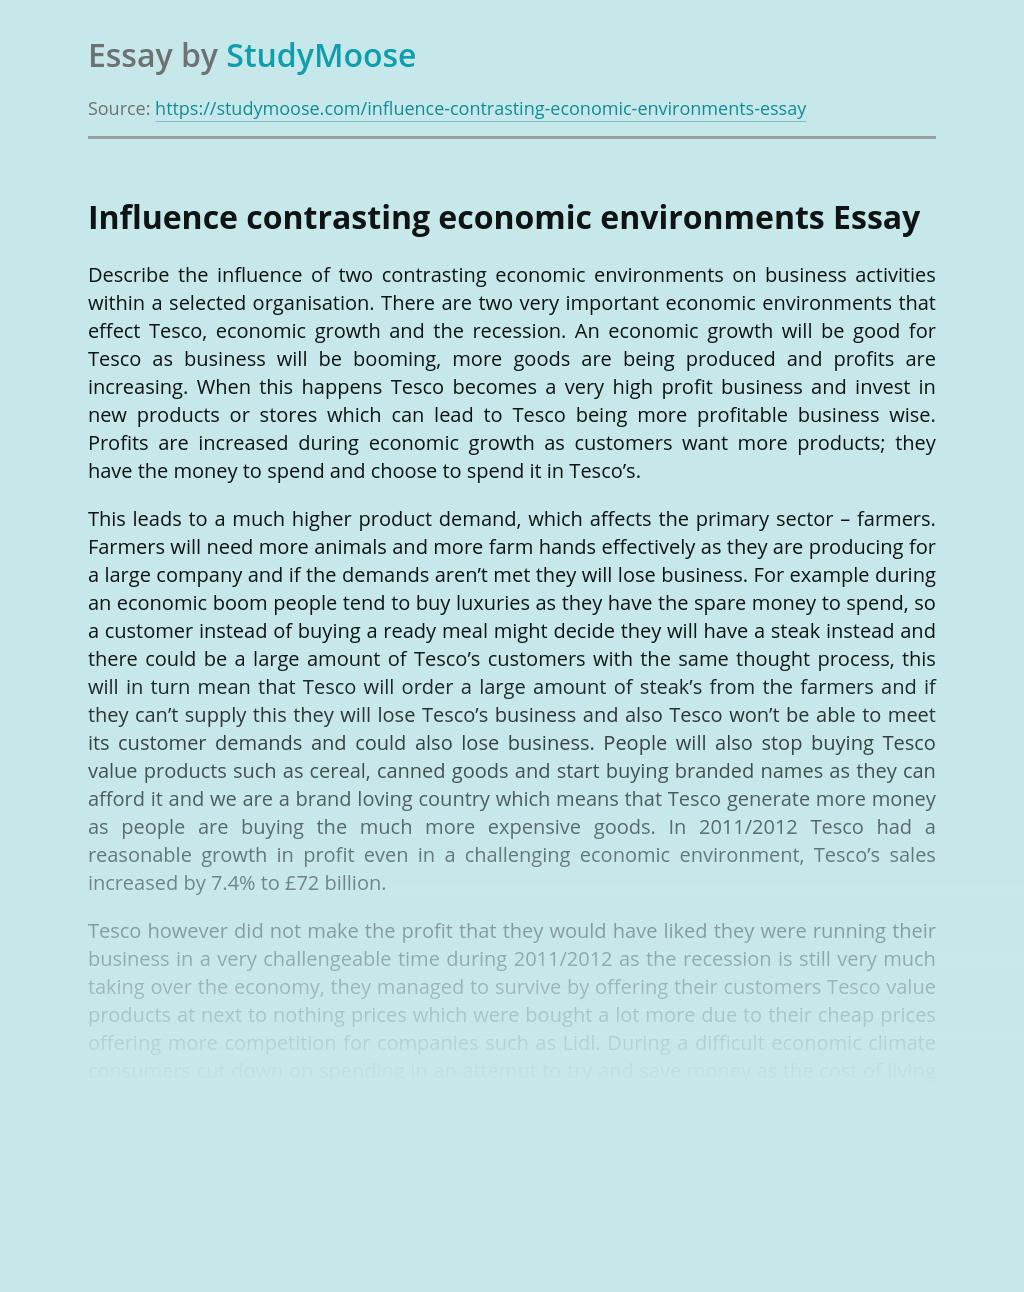 Influence contrasting economic environments